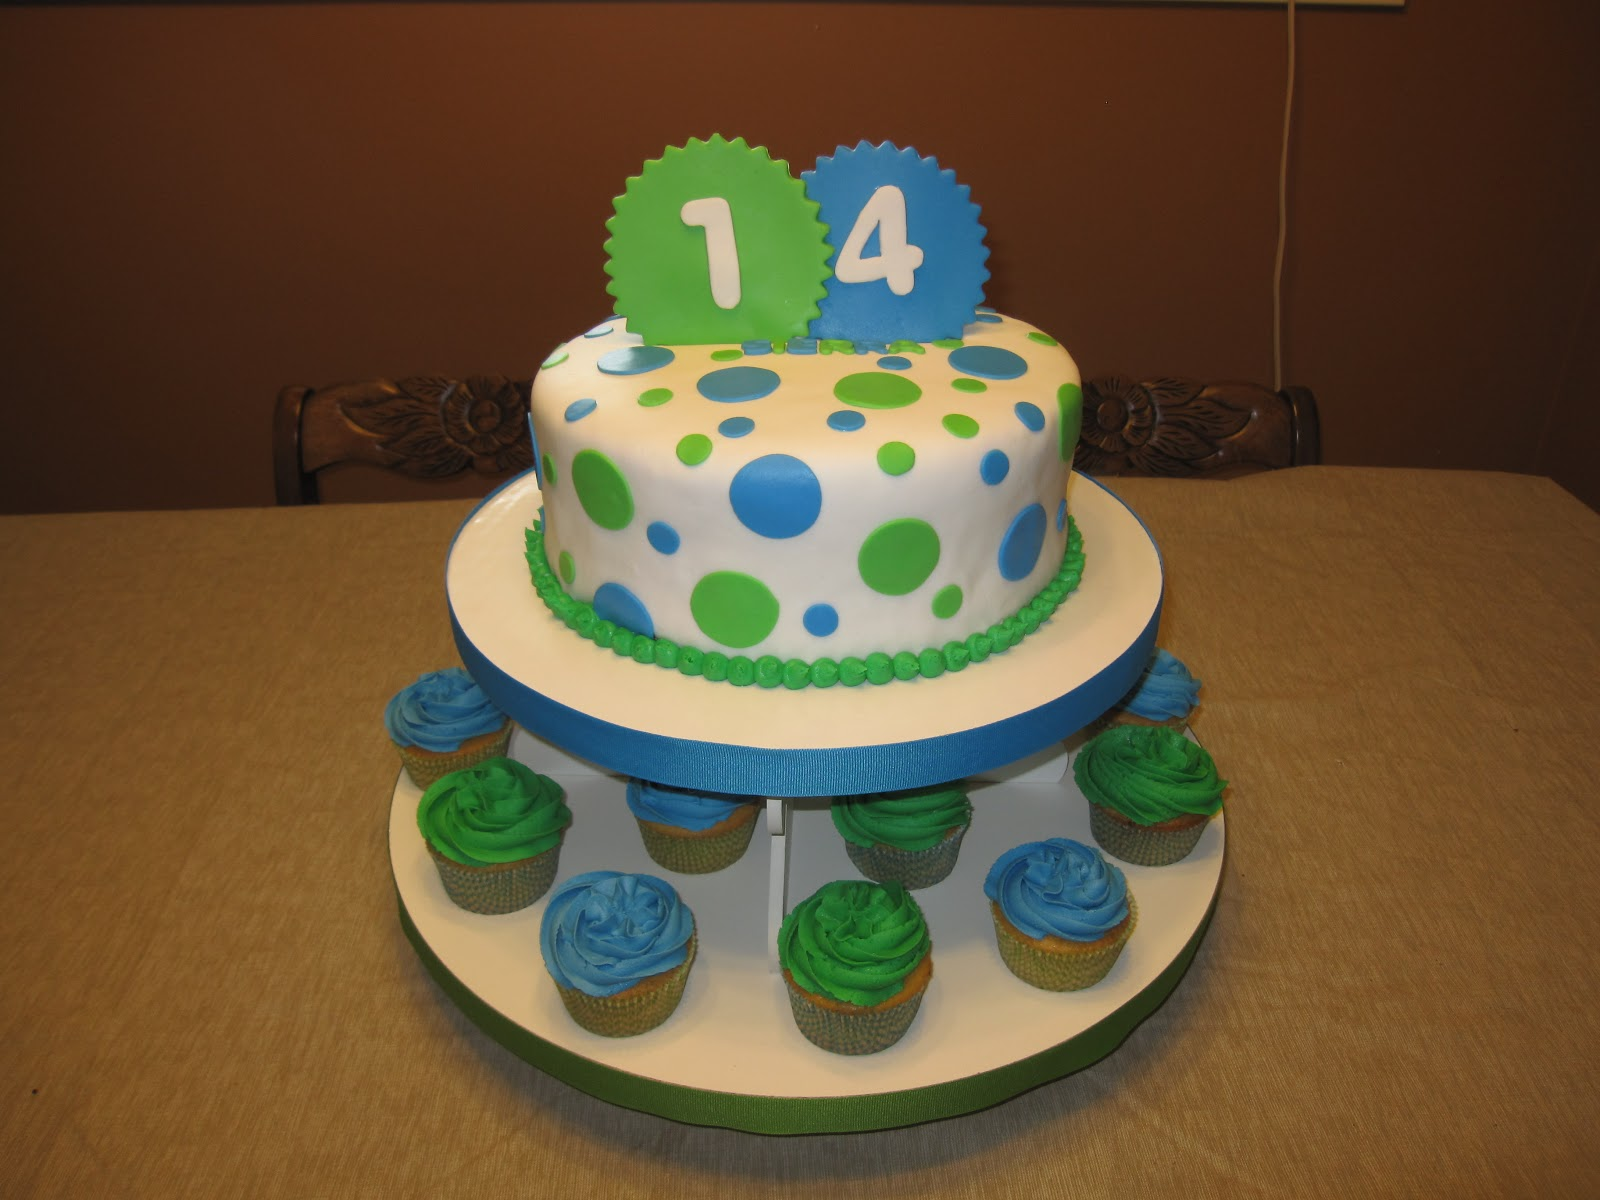 8 14 Year Old Birthday Cakes Funny Photo 14 Year Old Birthday